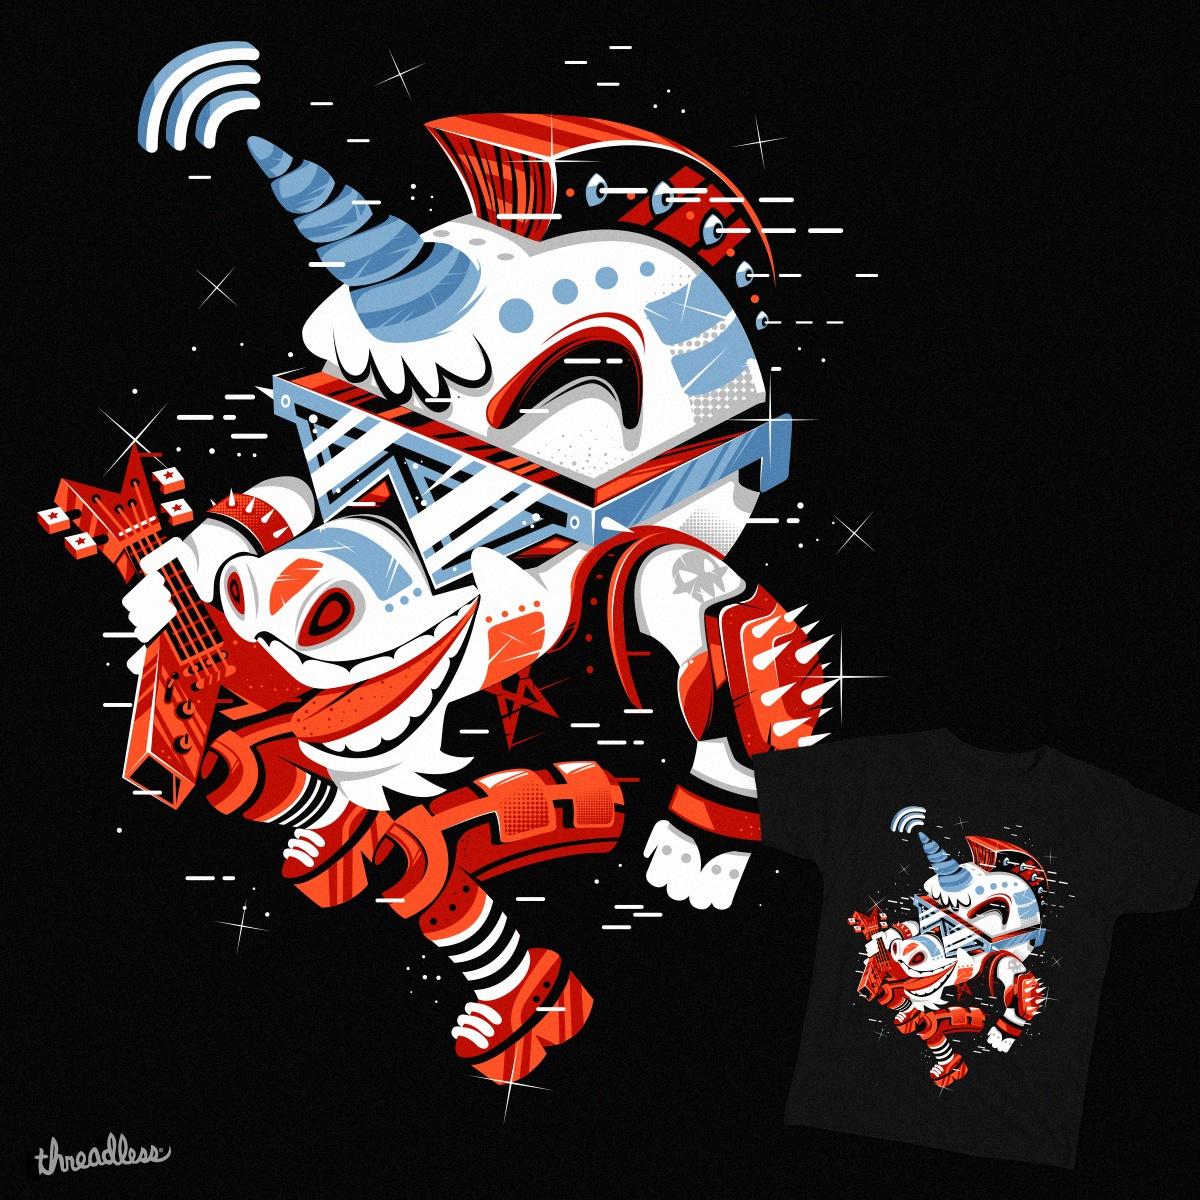 Rockstar unicorn with wifi by Newfrenmonster on Threadless